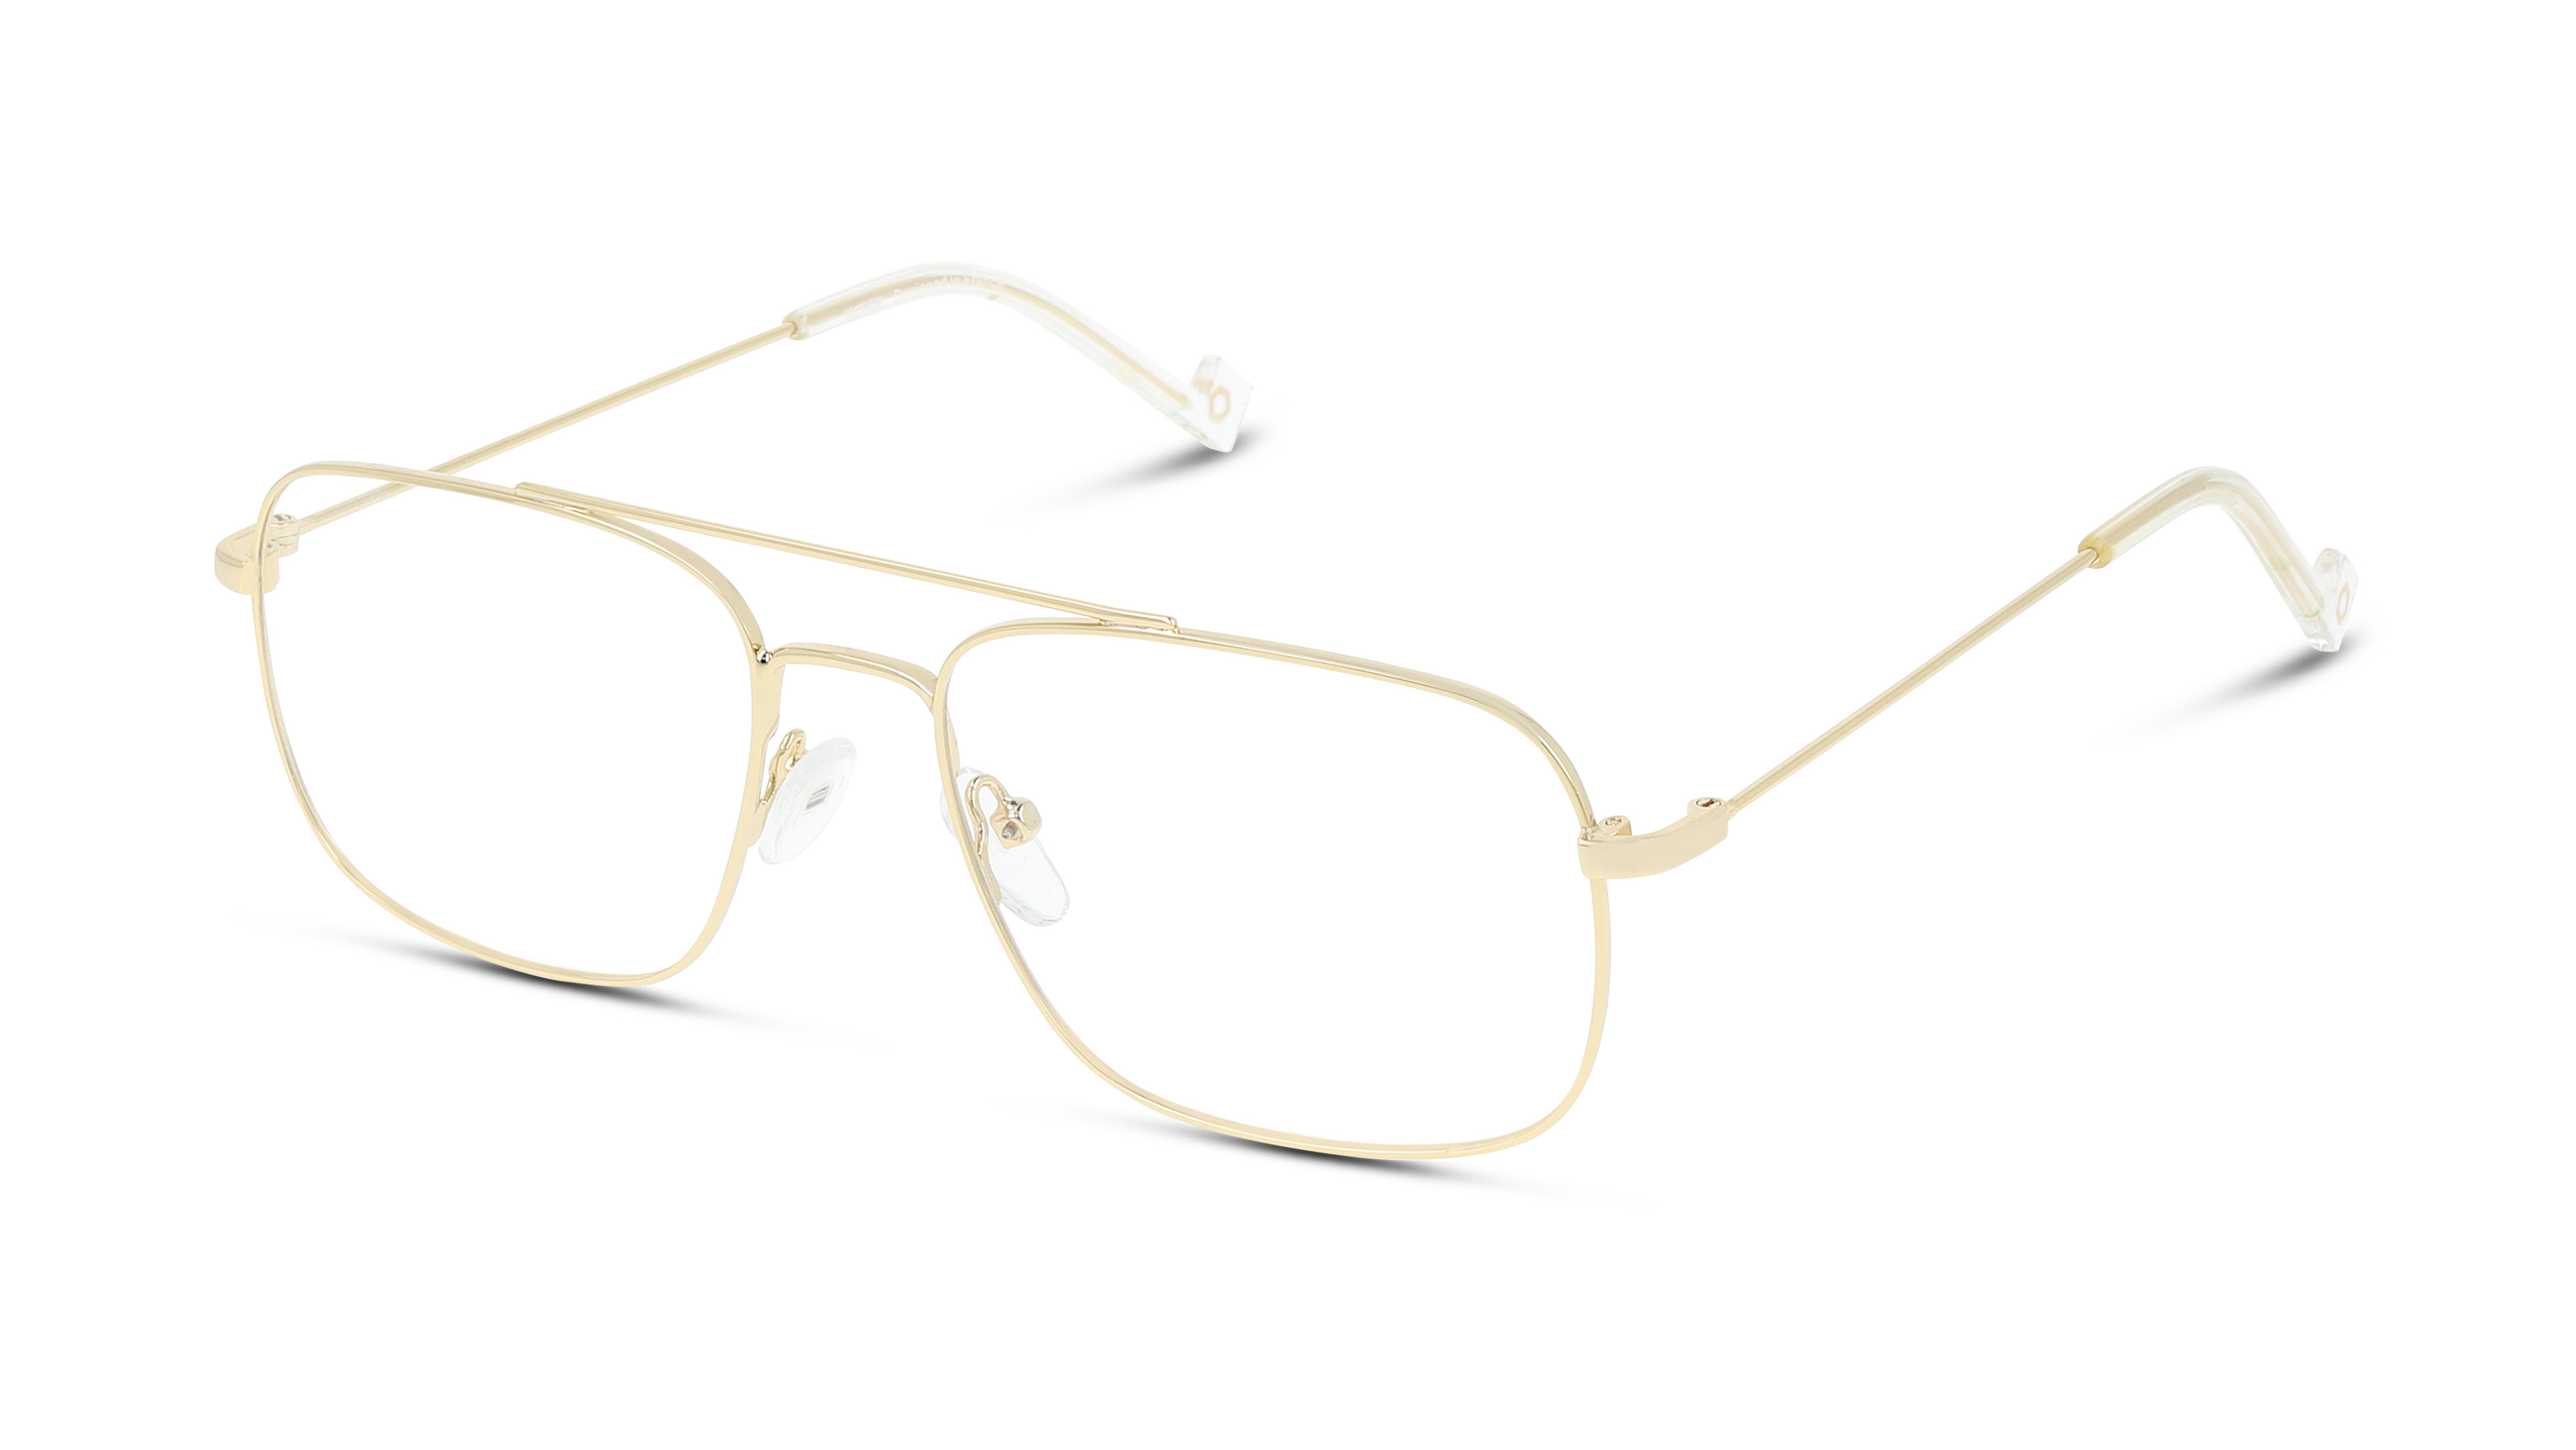 8719154738715-angle-brillenfassung-unofficial-unom0074-shape-up-box-9-gold-gold